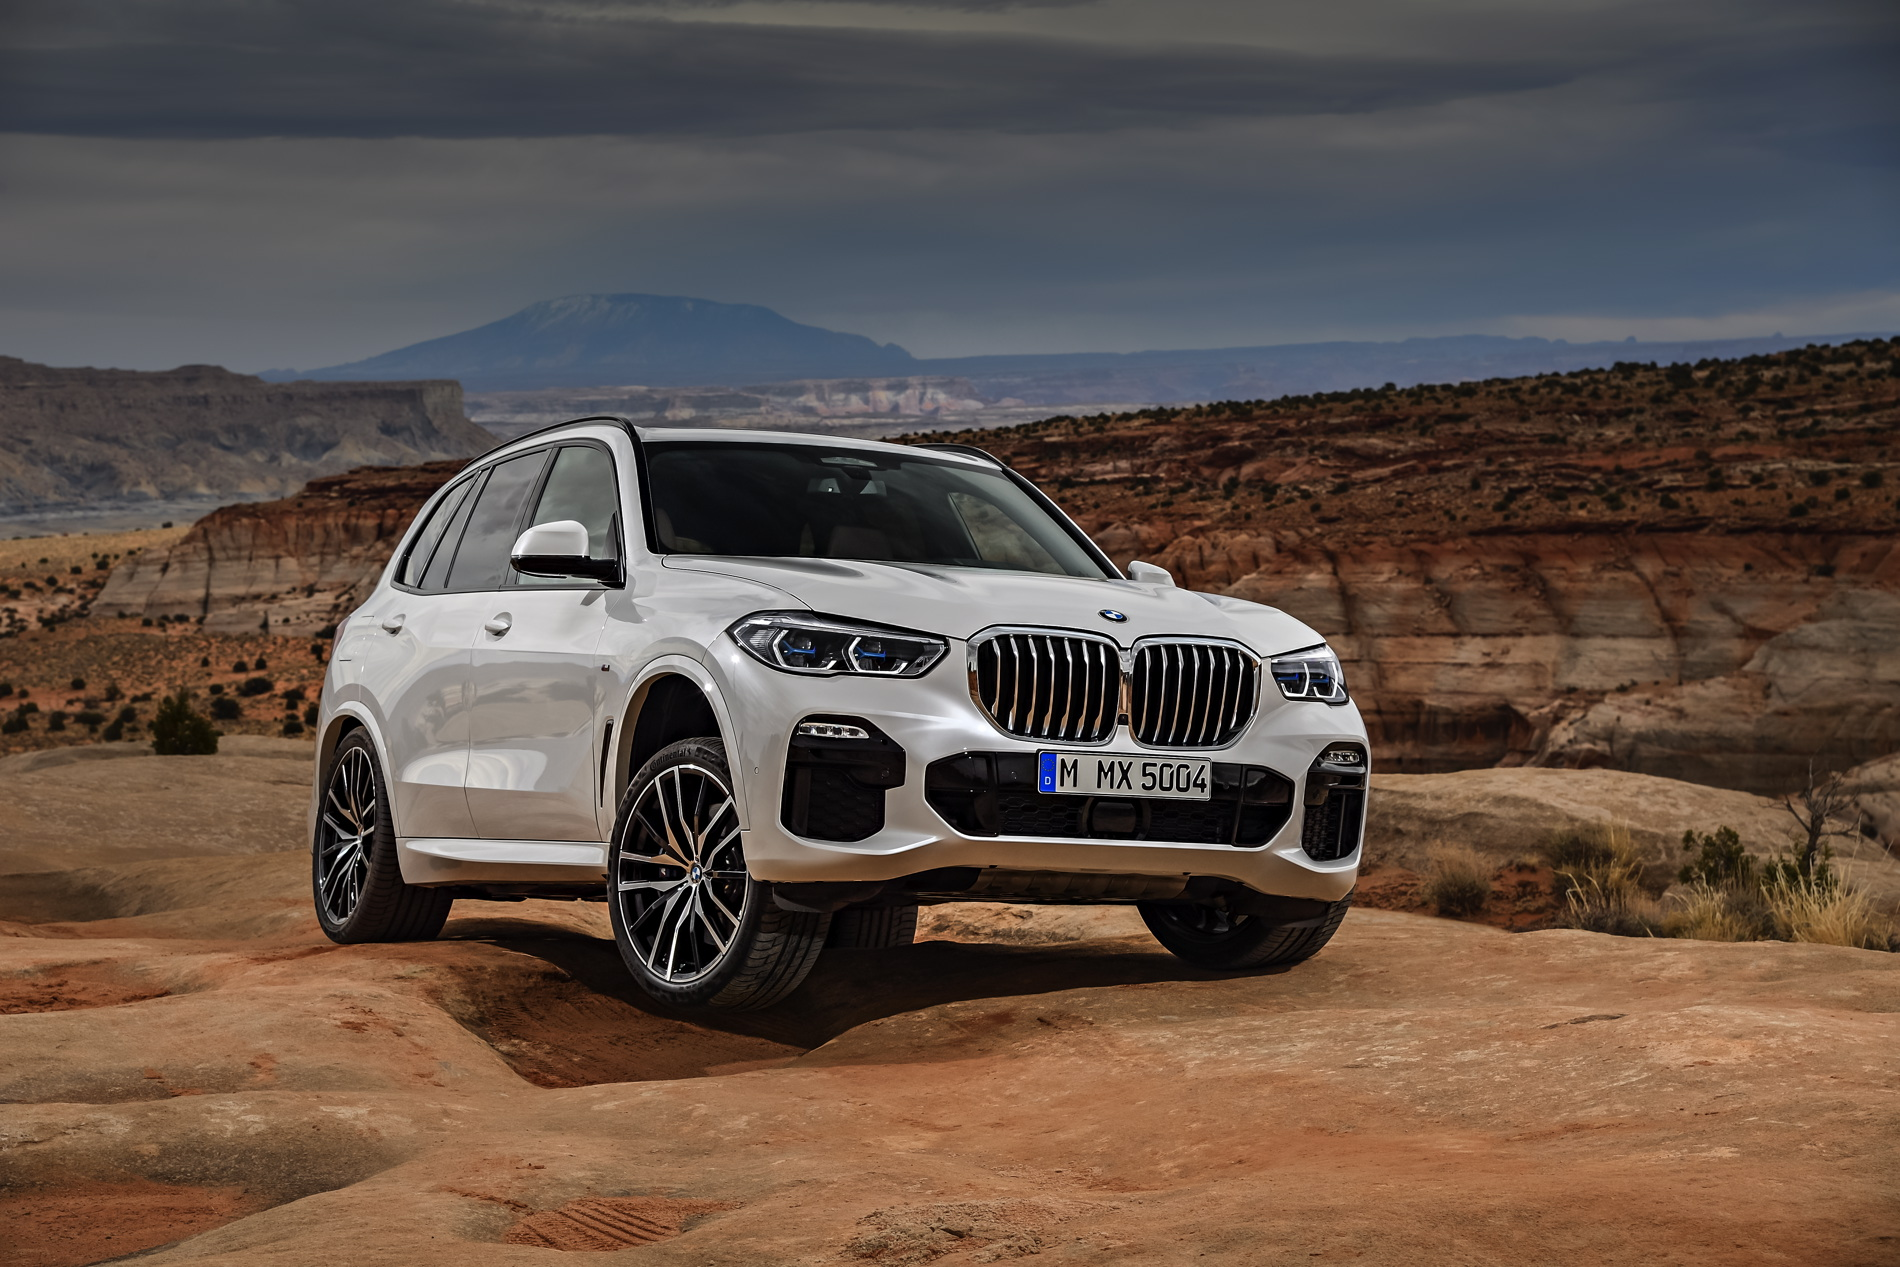 2018 BMW G05 X5 exterior 18